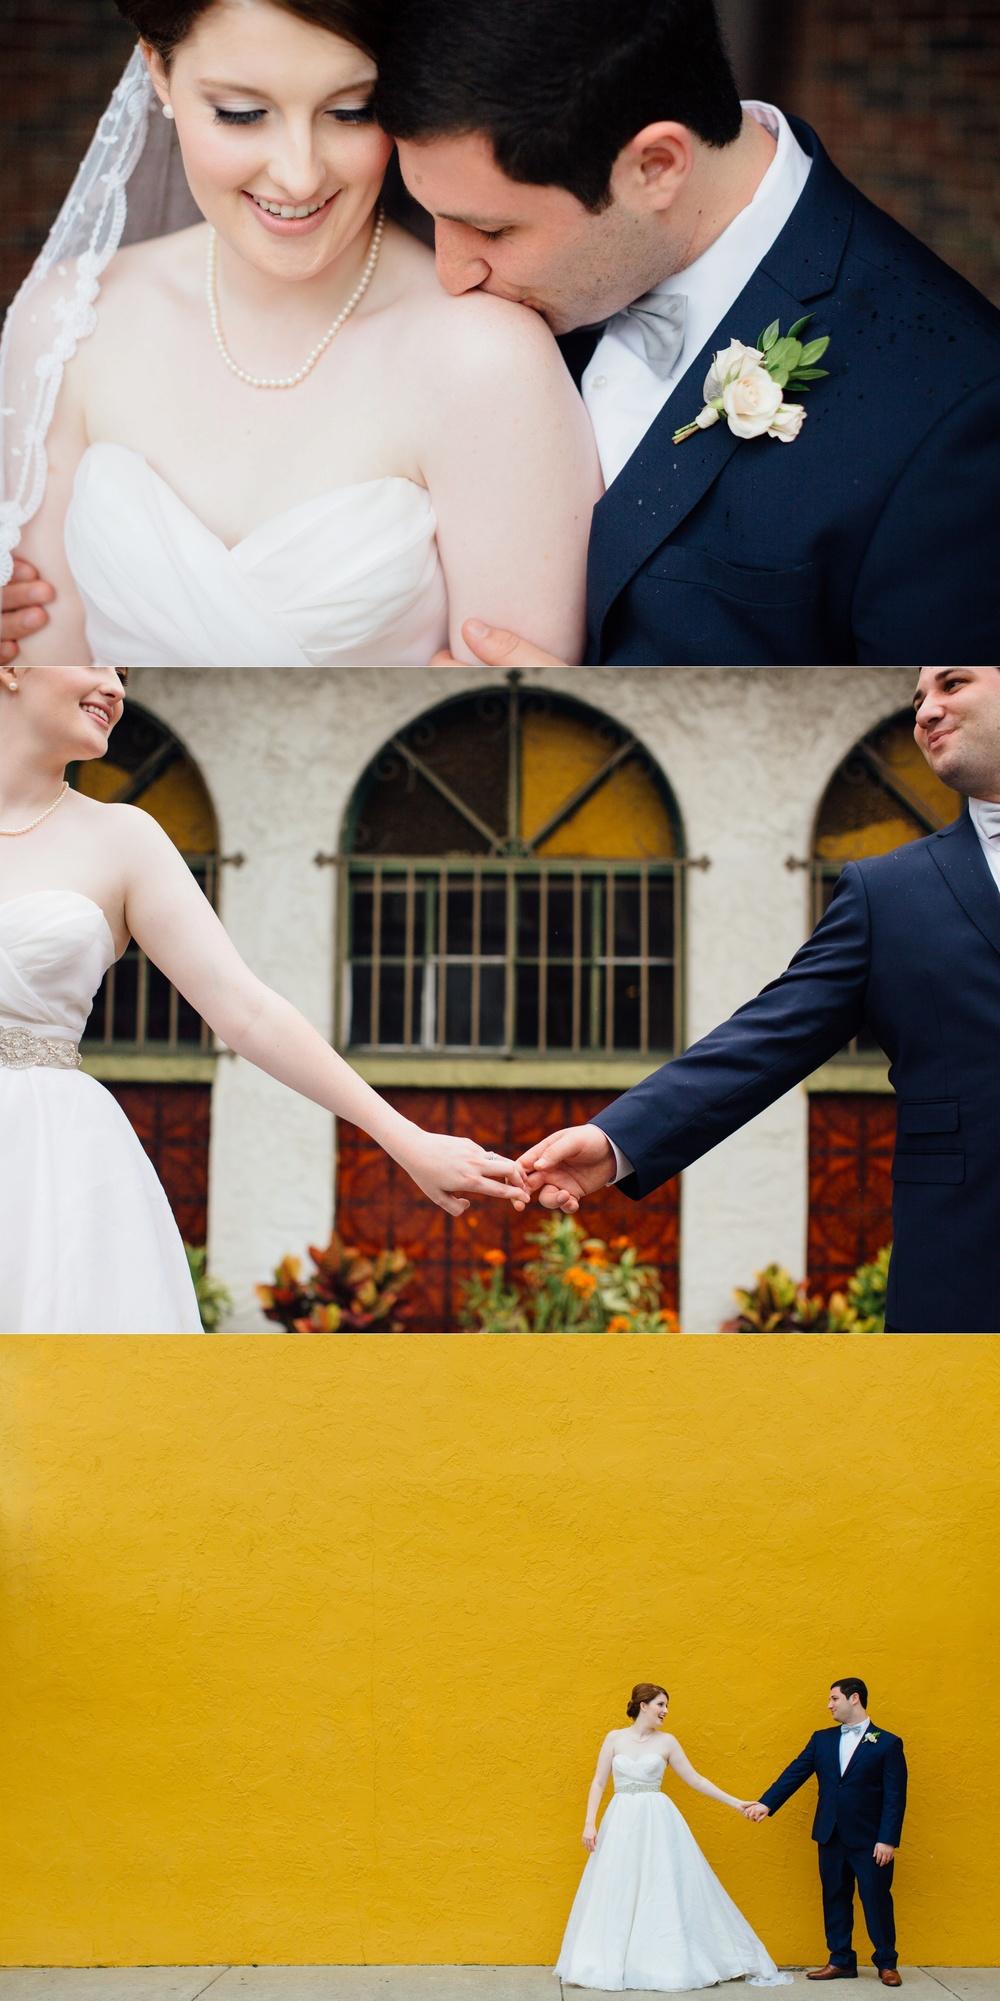 jake-and-katie-wedding-favorites-2015-52